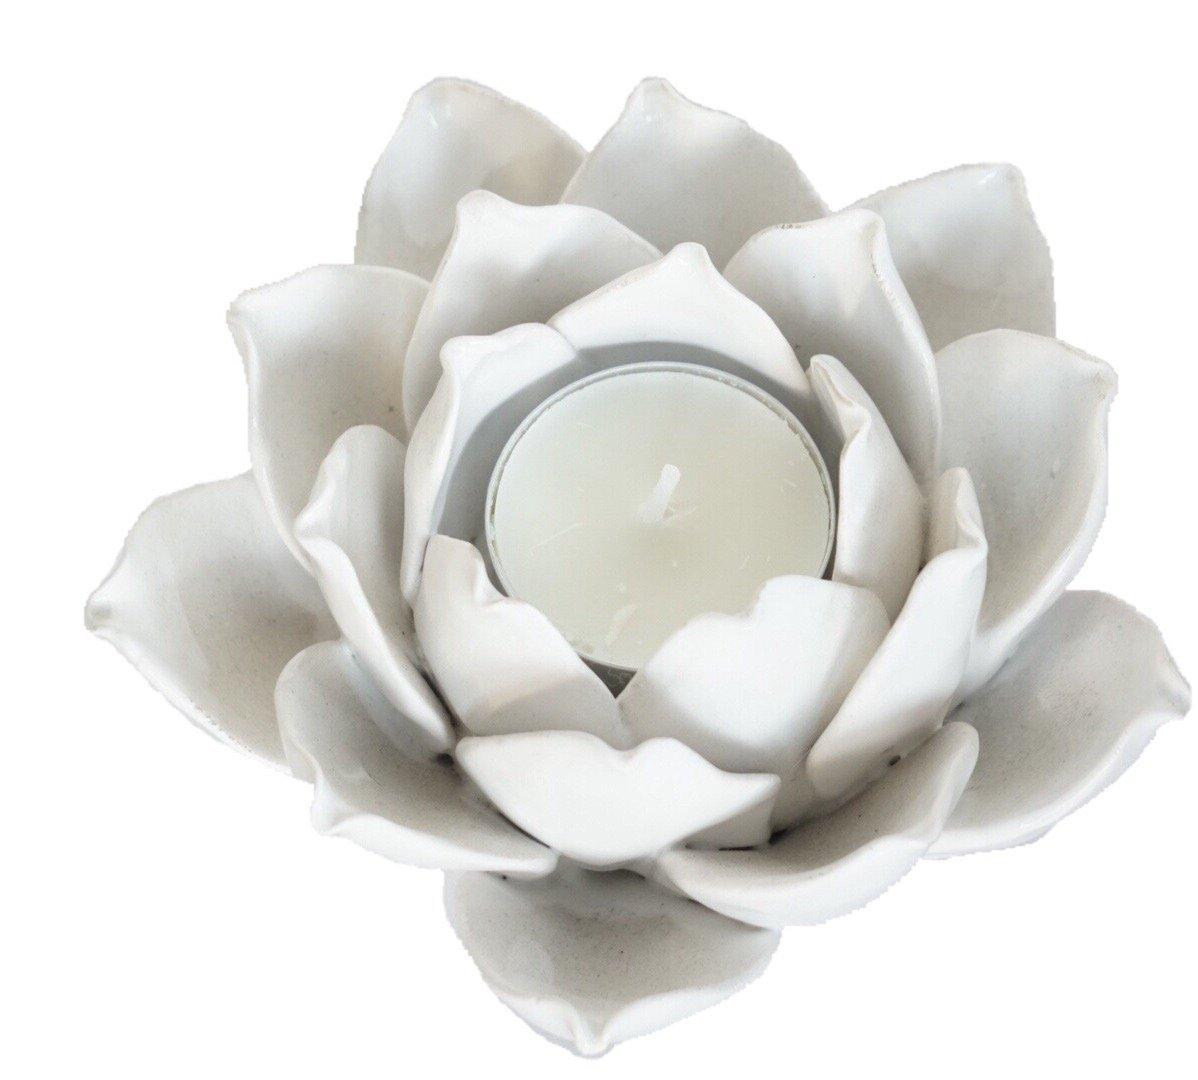 805fab49d1 Amazon.com: Ceramic Lotus Style Flower Tea Light Holder - White: Home &  Kitchen